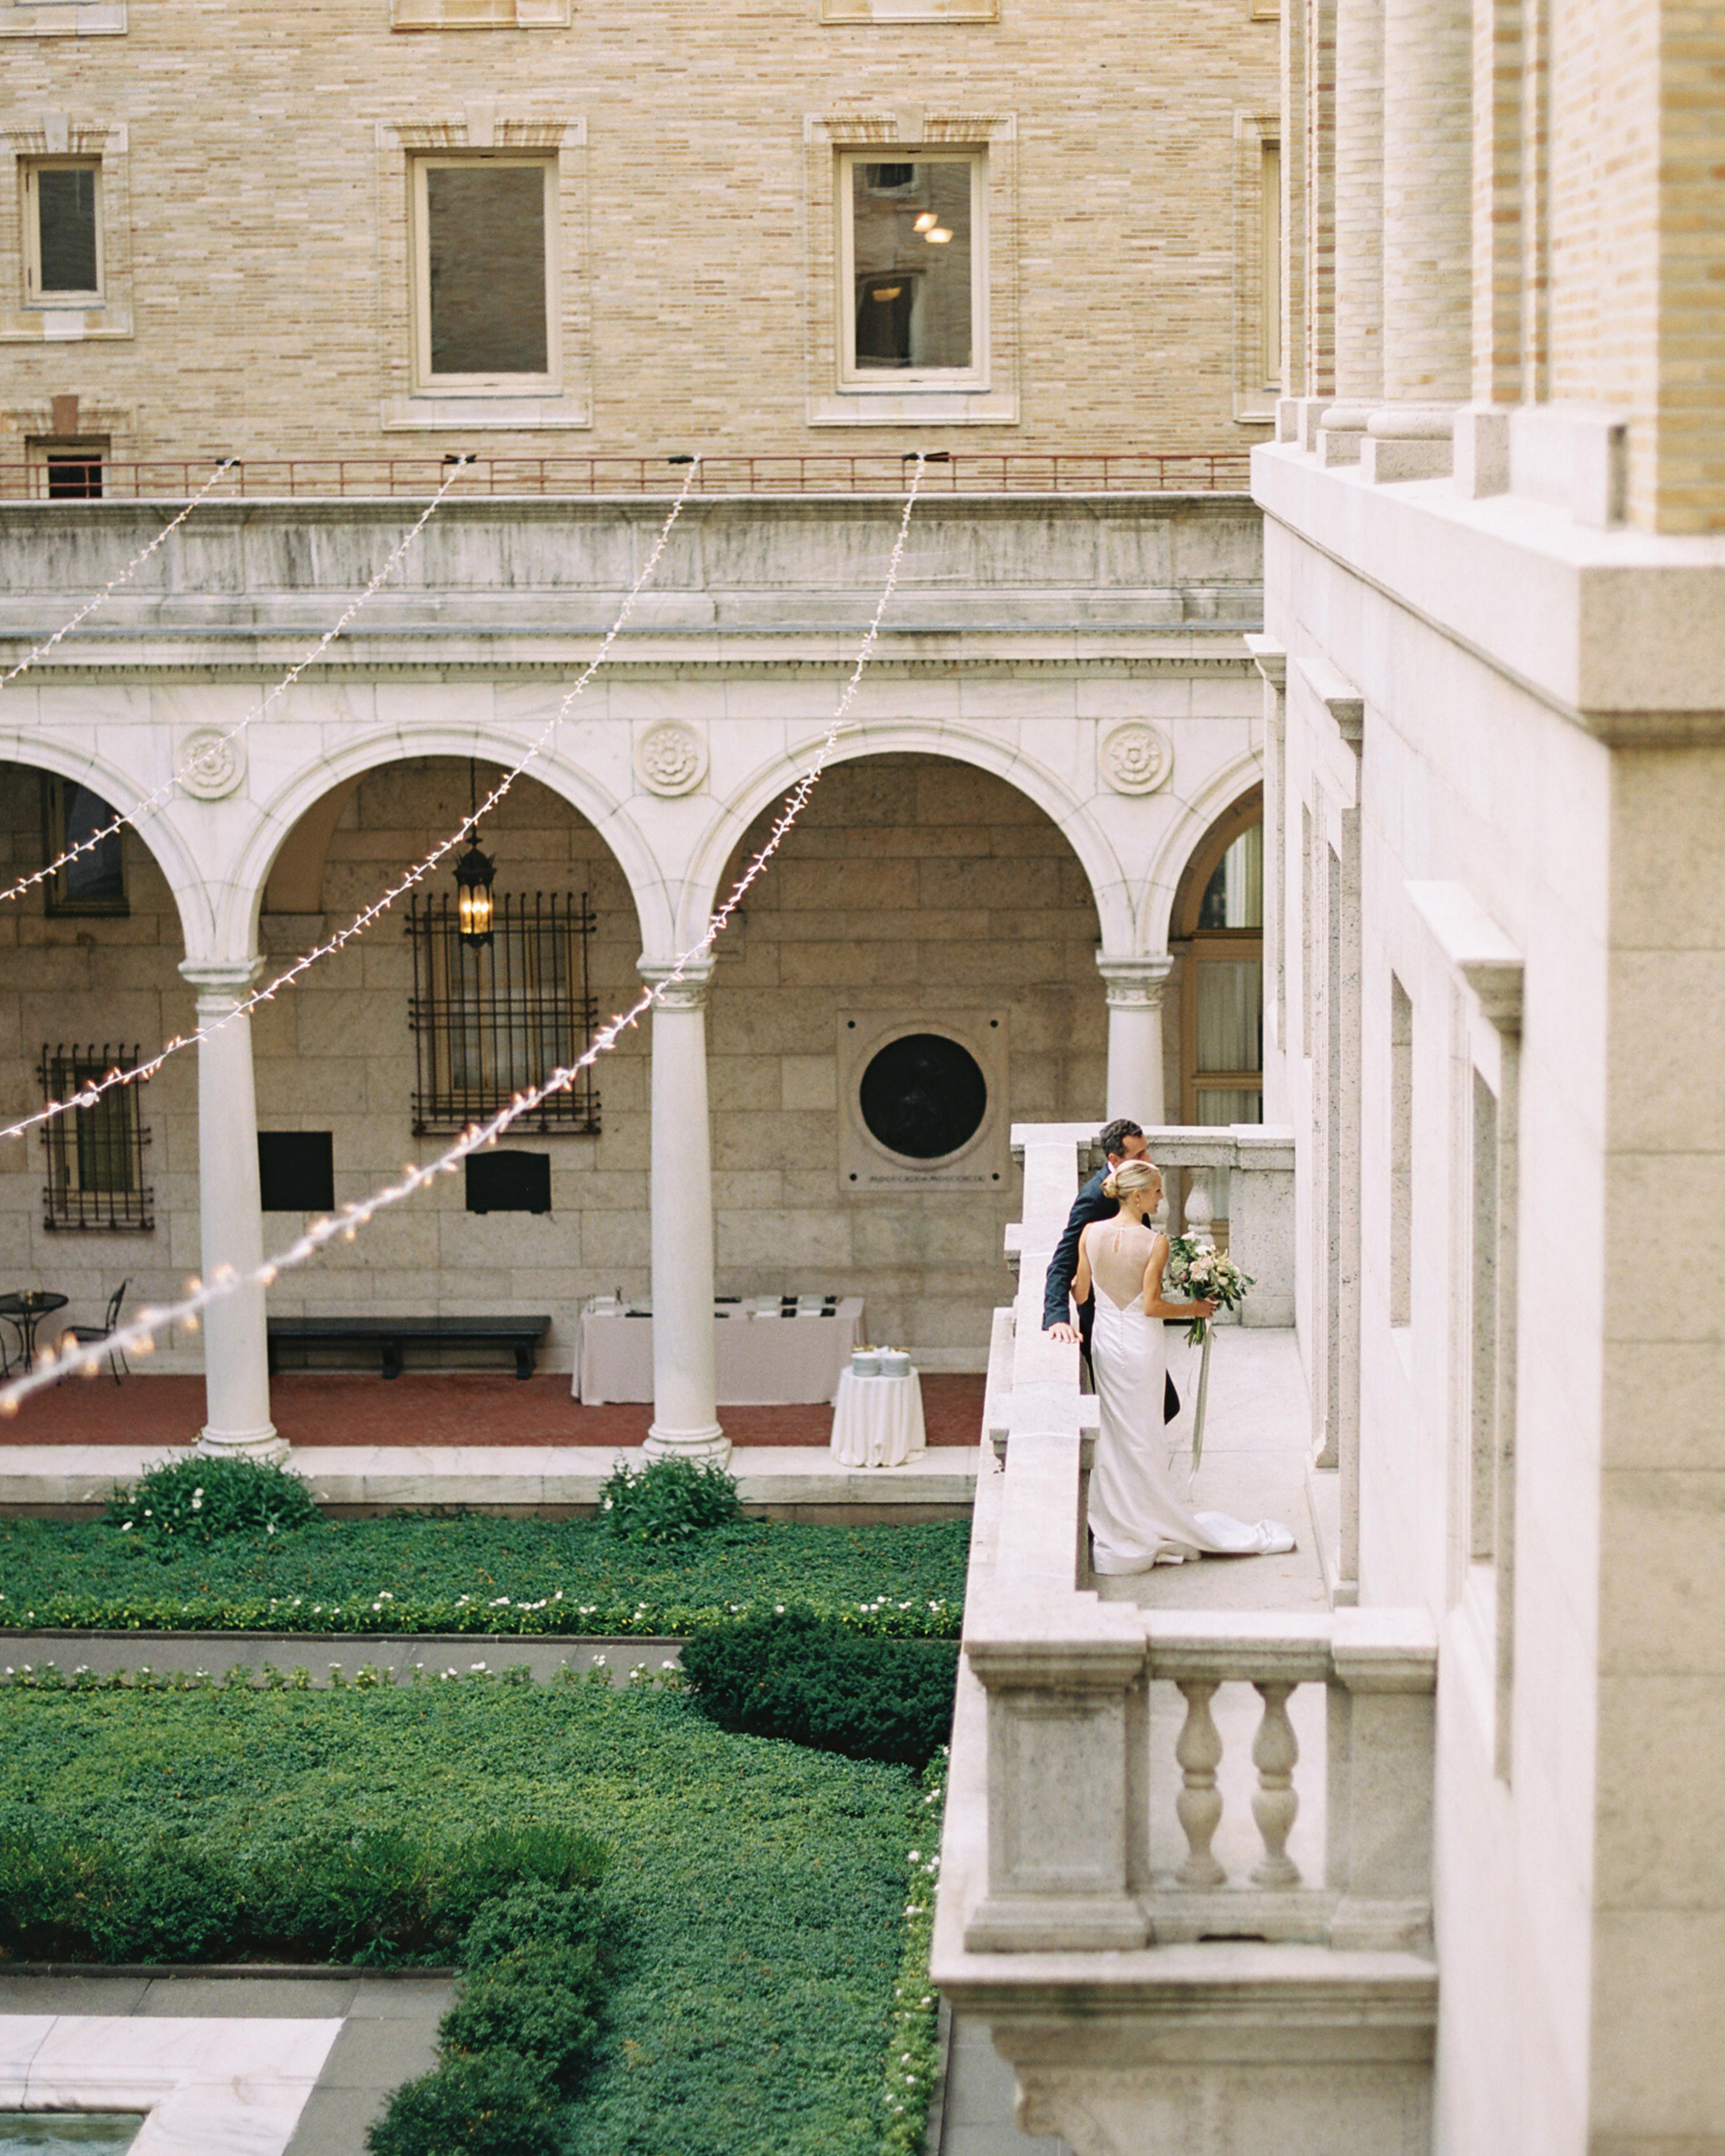 katie-kent-wedding-couple-345-s112765-0316.jpg